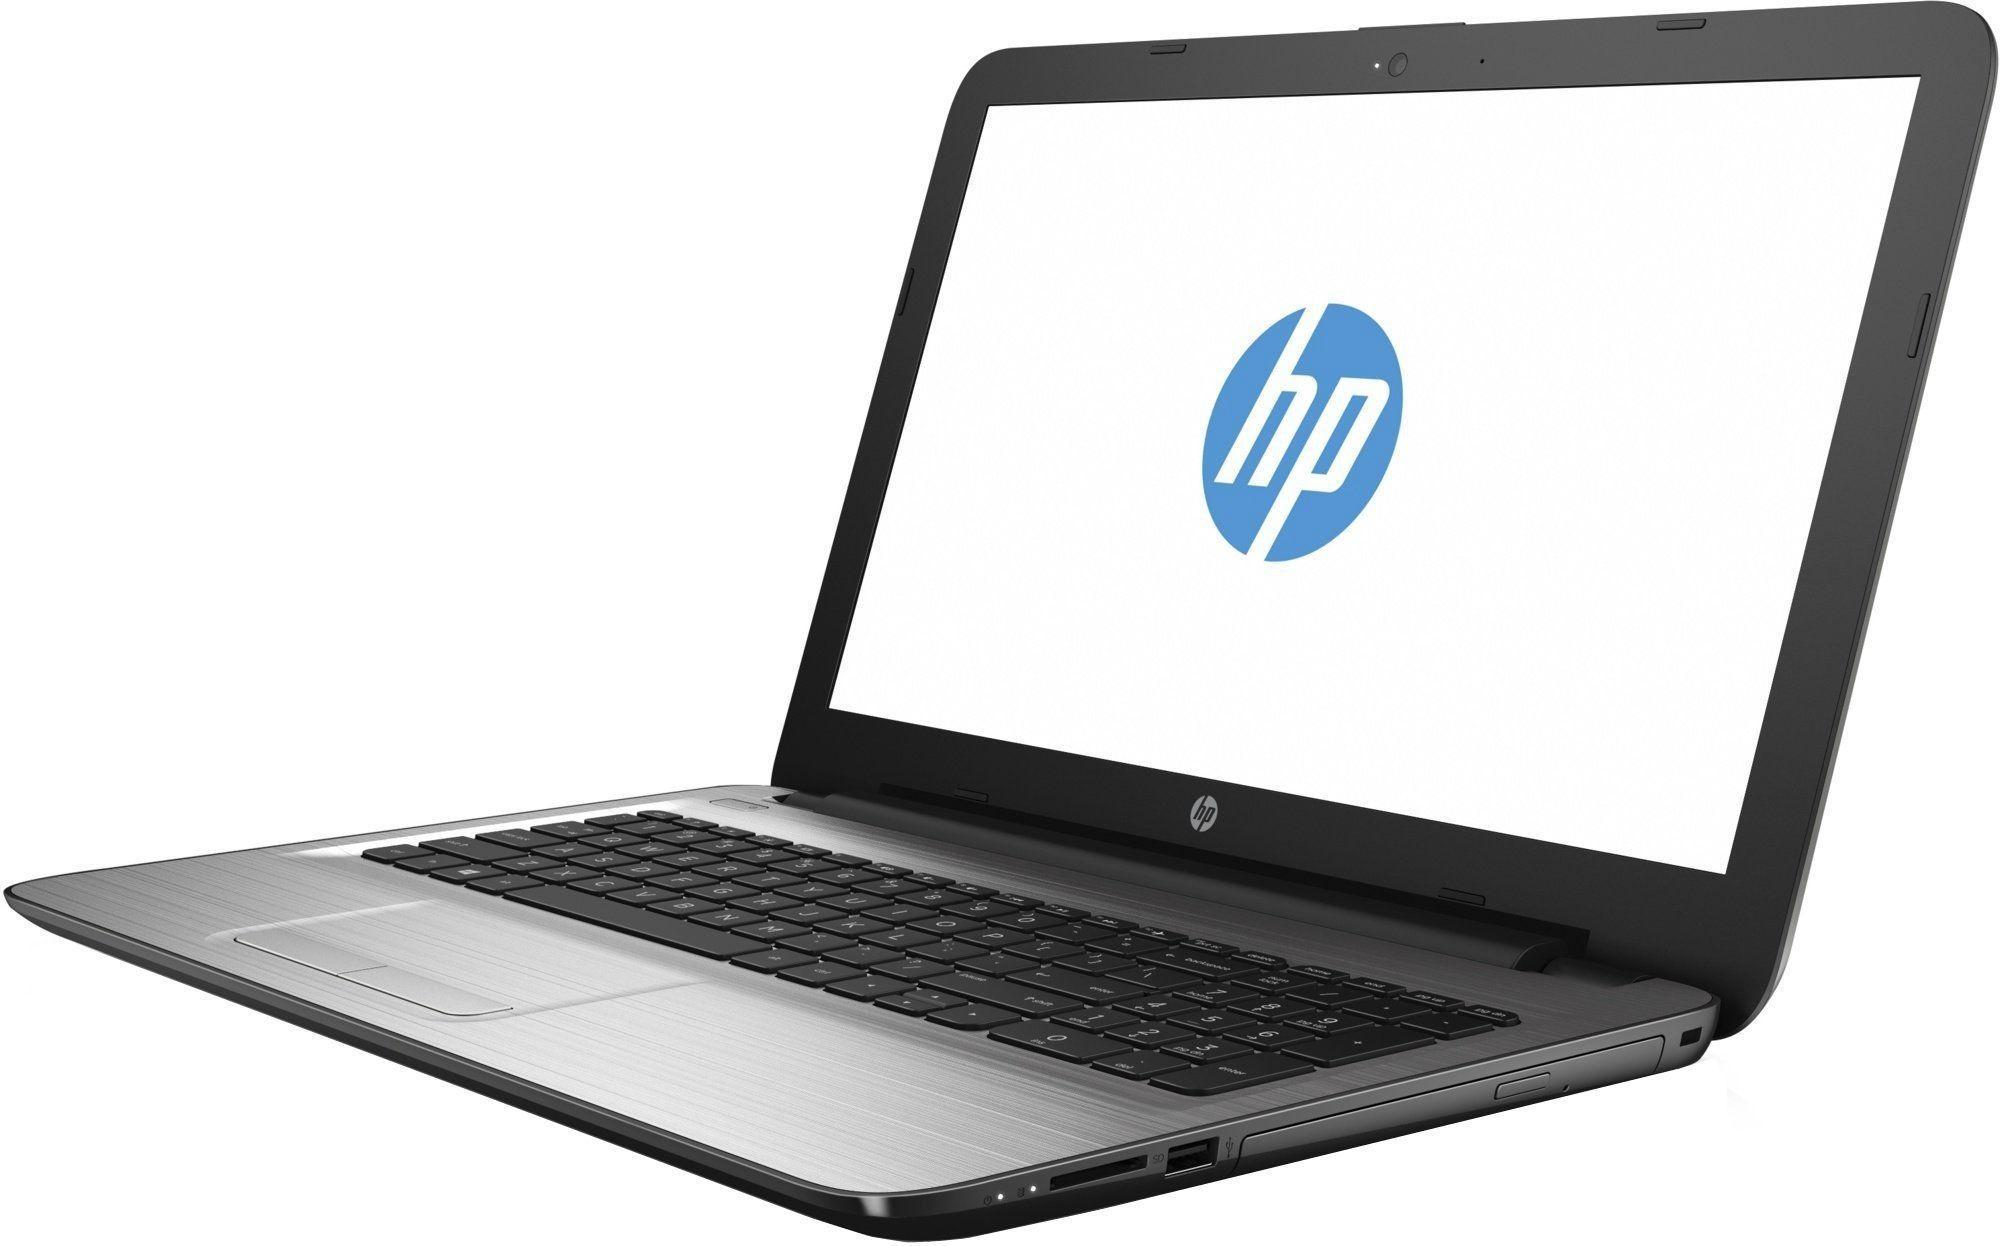 Купить Ноутбук HP 250 G5 (1KA00EA) фото 2